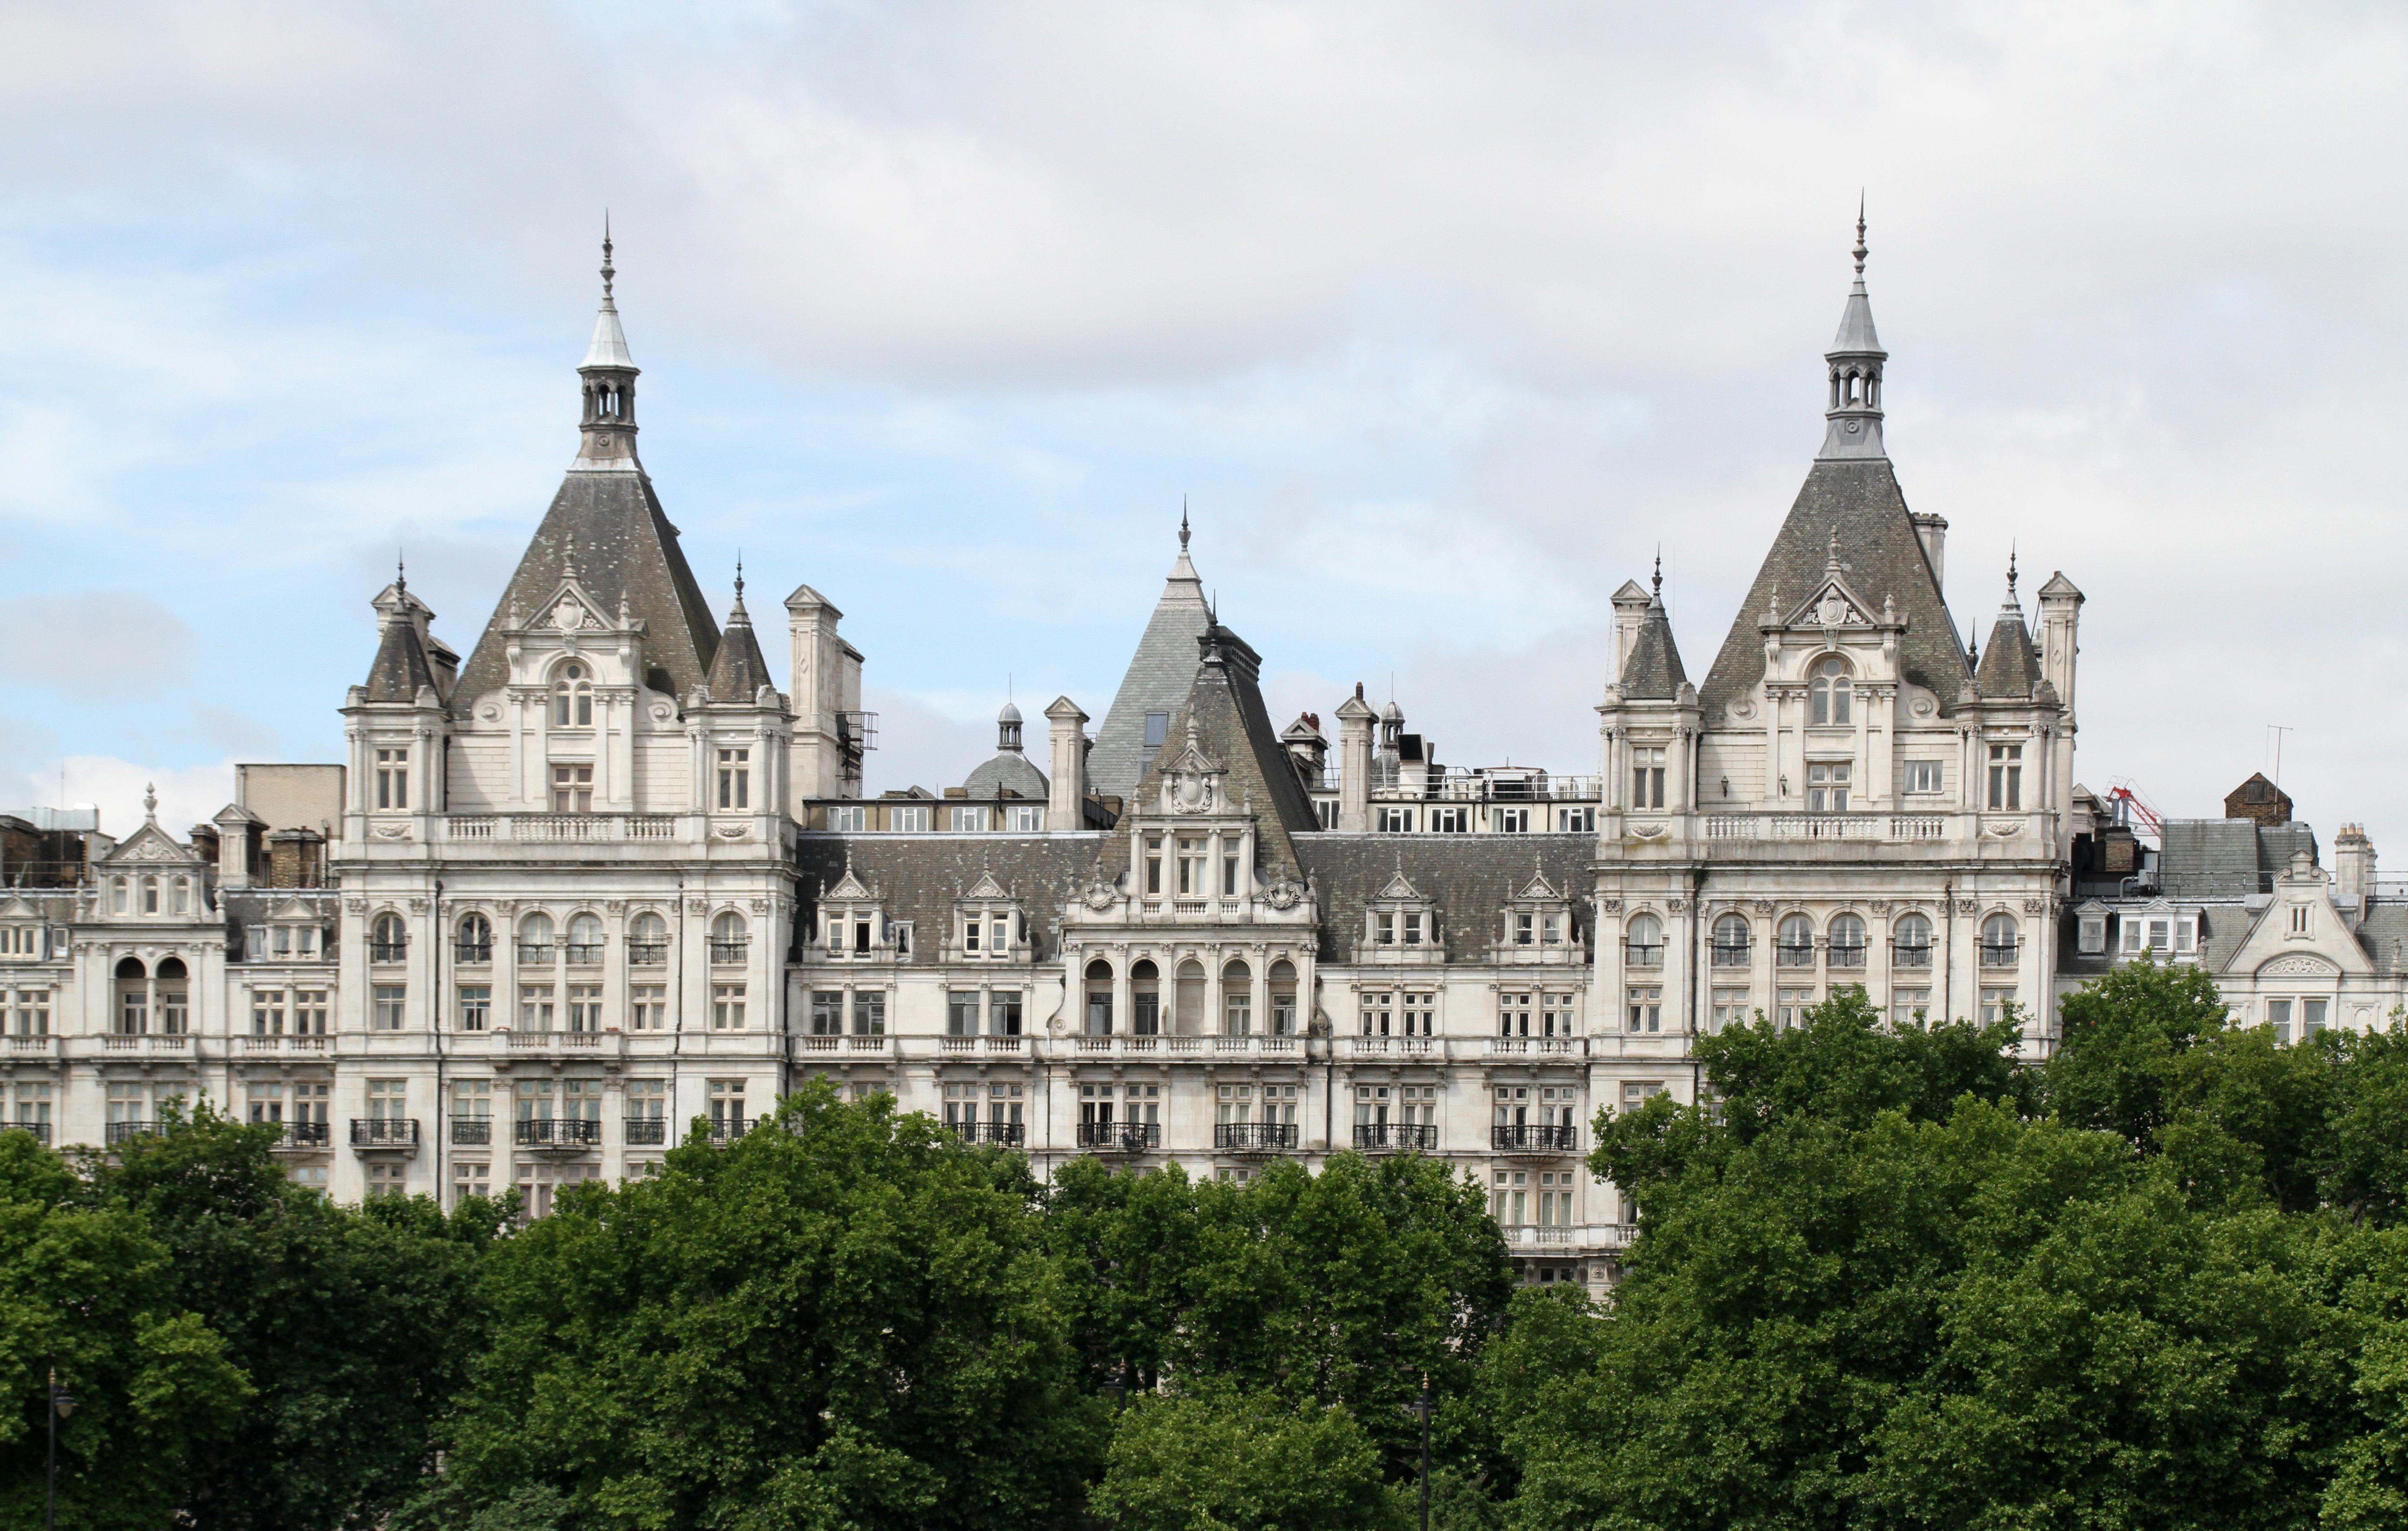 Royal Horseguards Hotel - Wikipedia